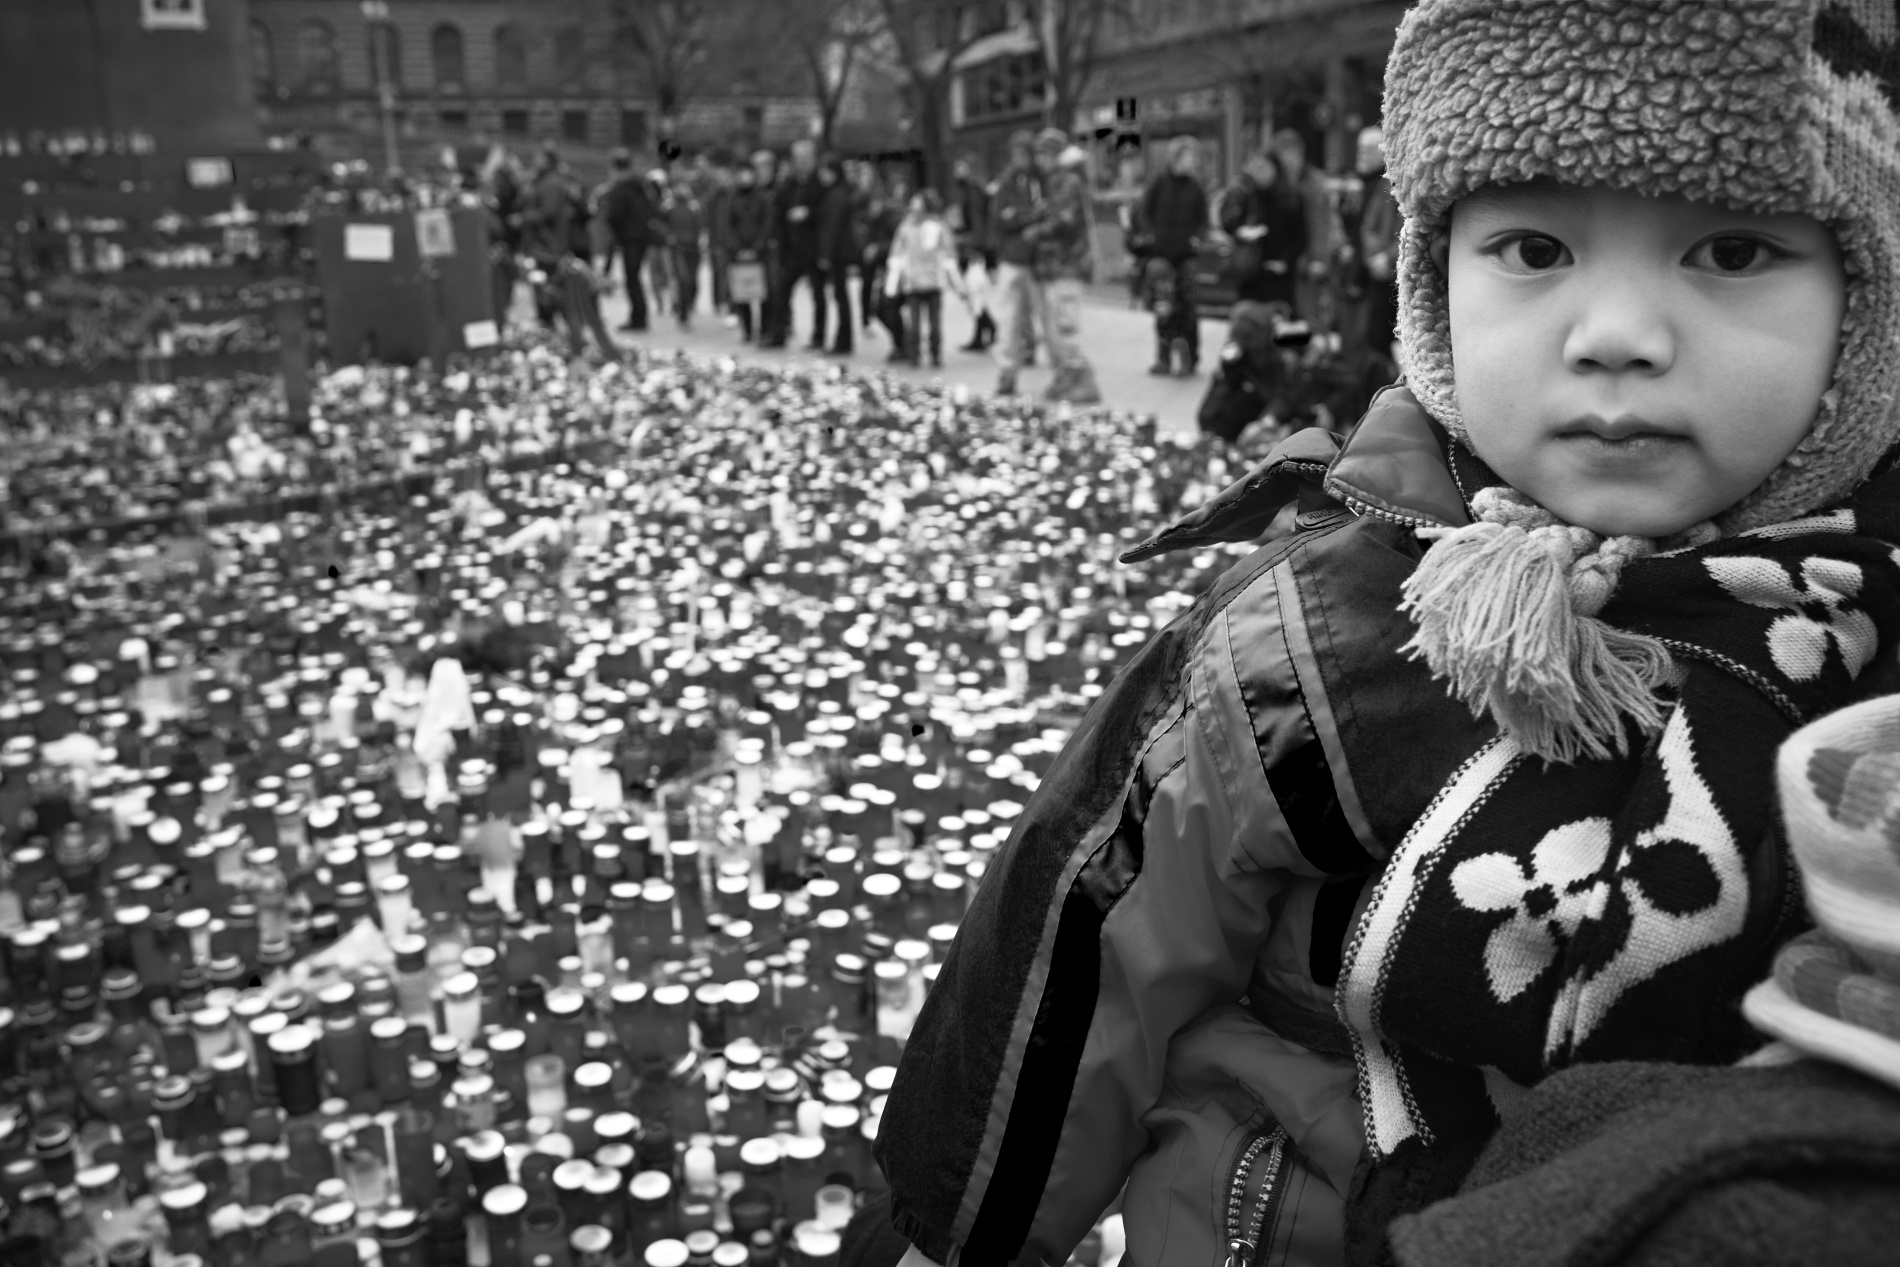 Den_rozlouceni_23.12.2011_127